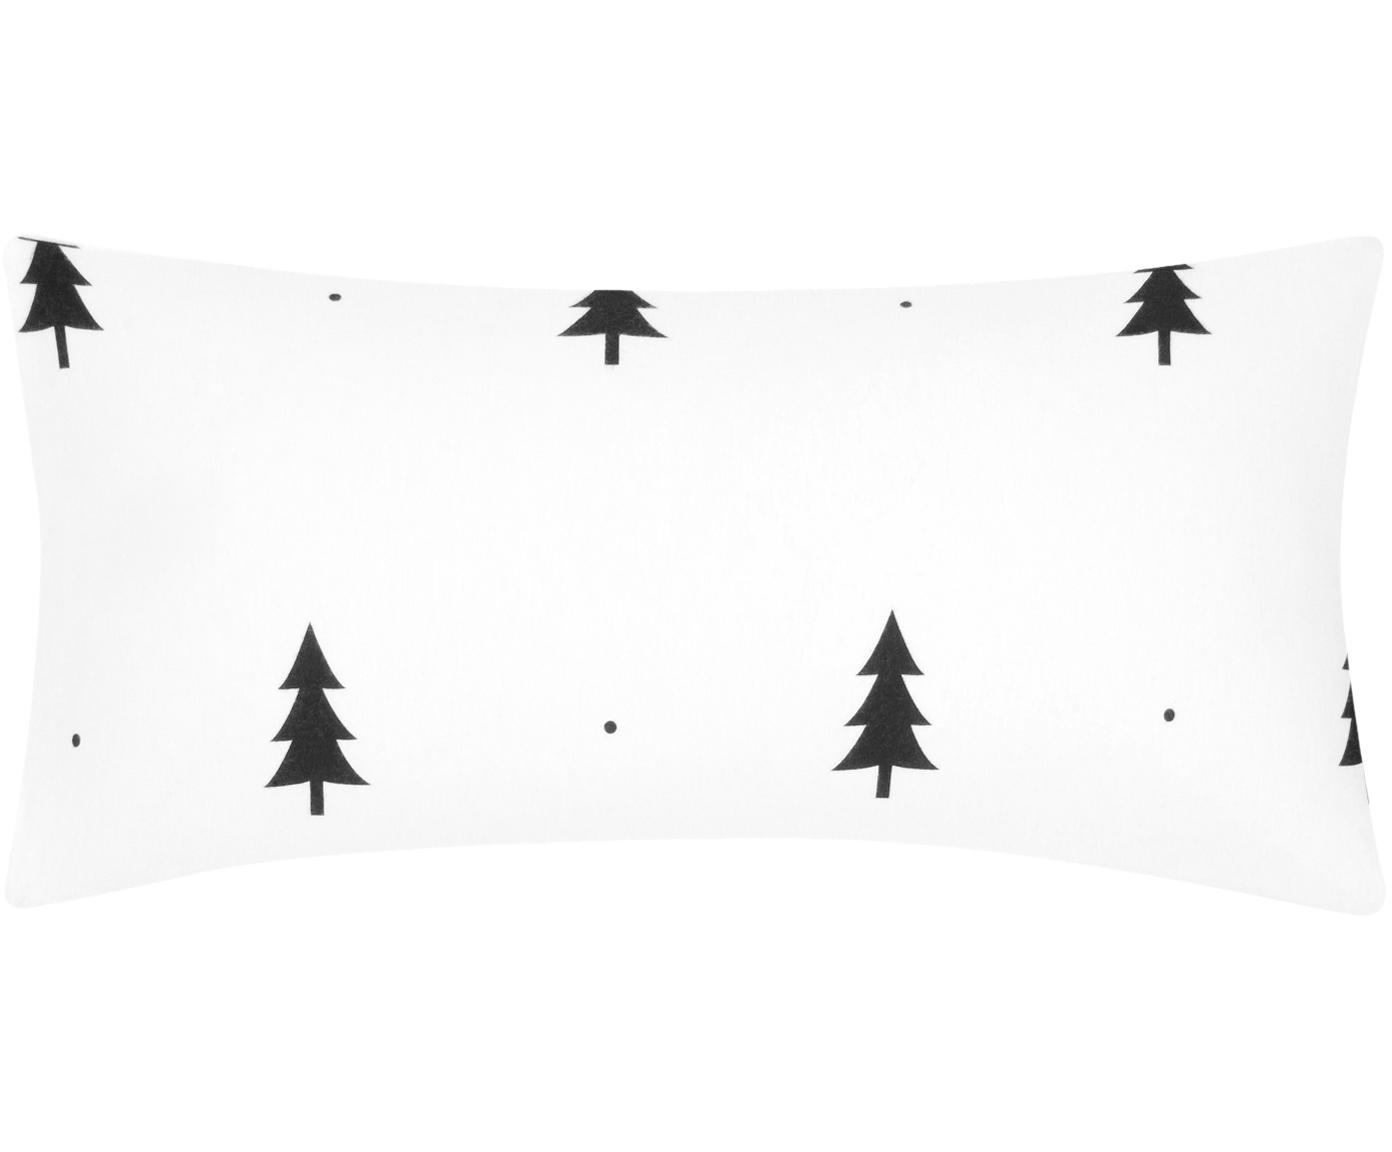 Poszewka na poduszkę z flaneli Nordic, 2 szt., Biały, czarny, S 40 x D 80 cm